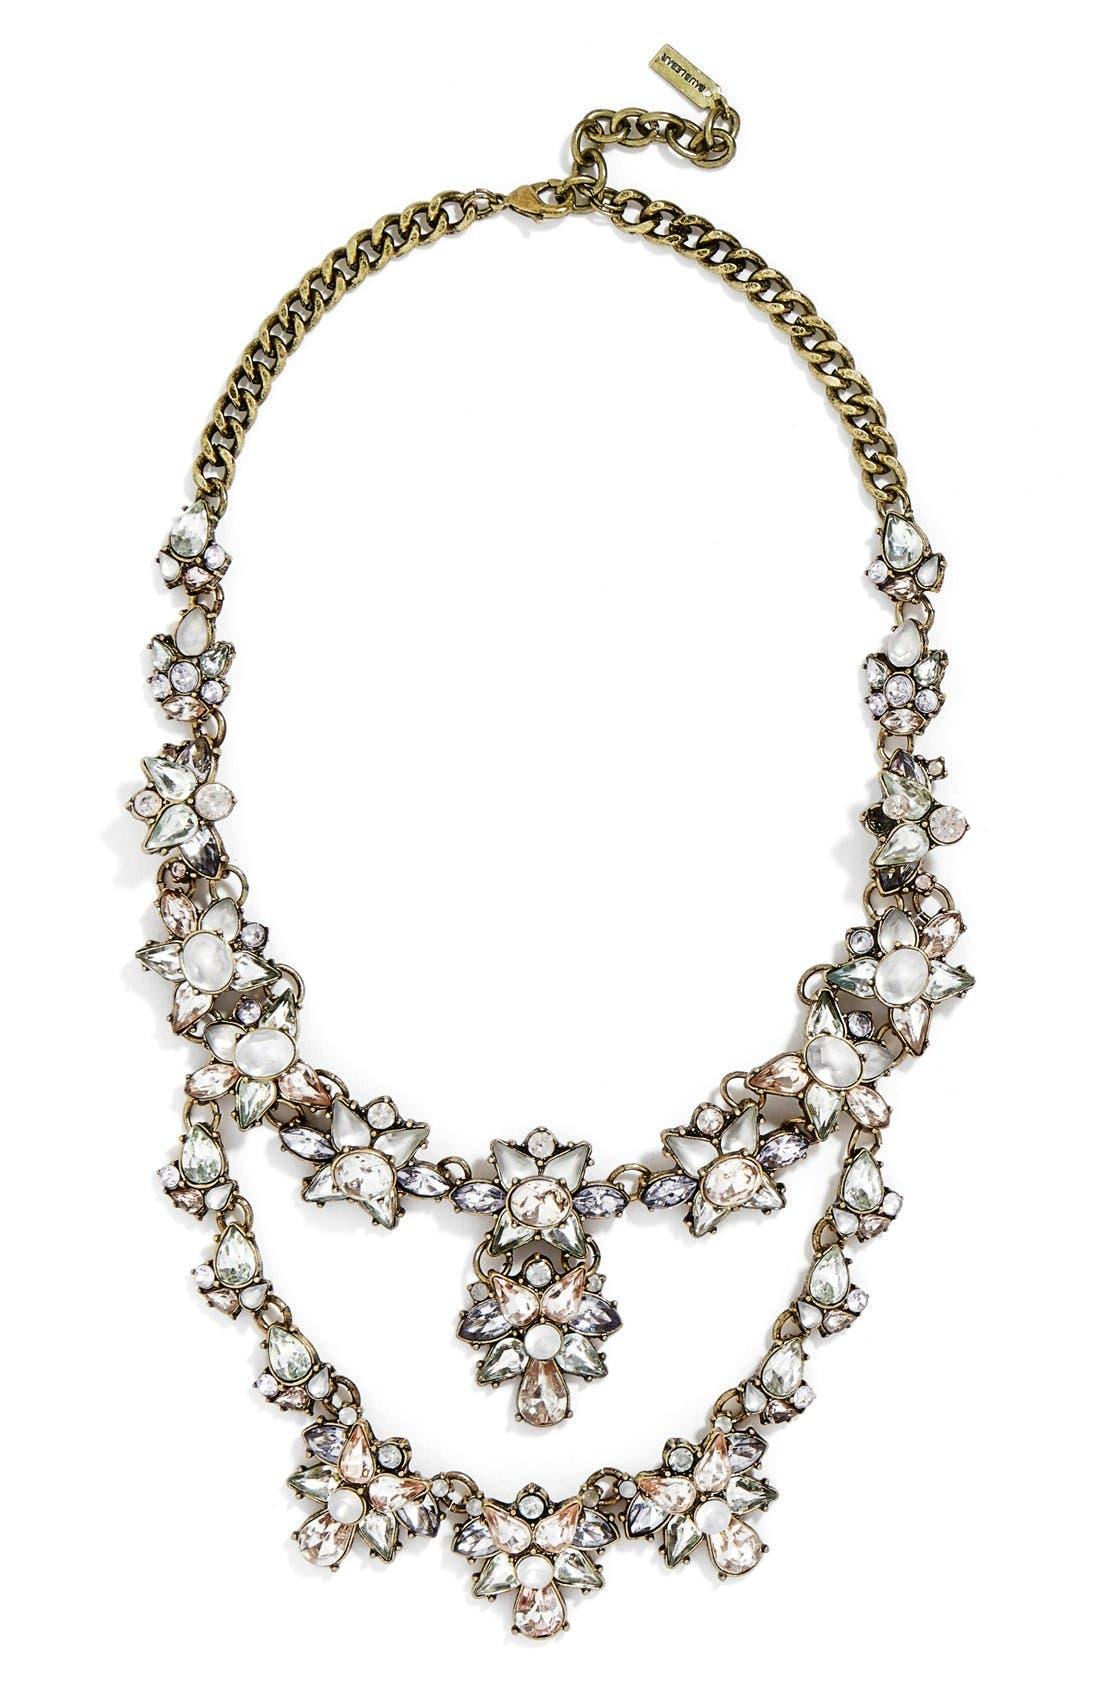 Main Image - BaubleBar 'Emma' Bib Necklace